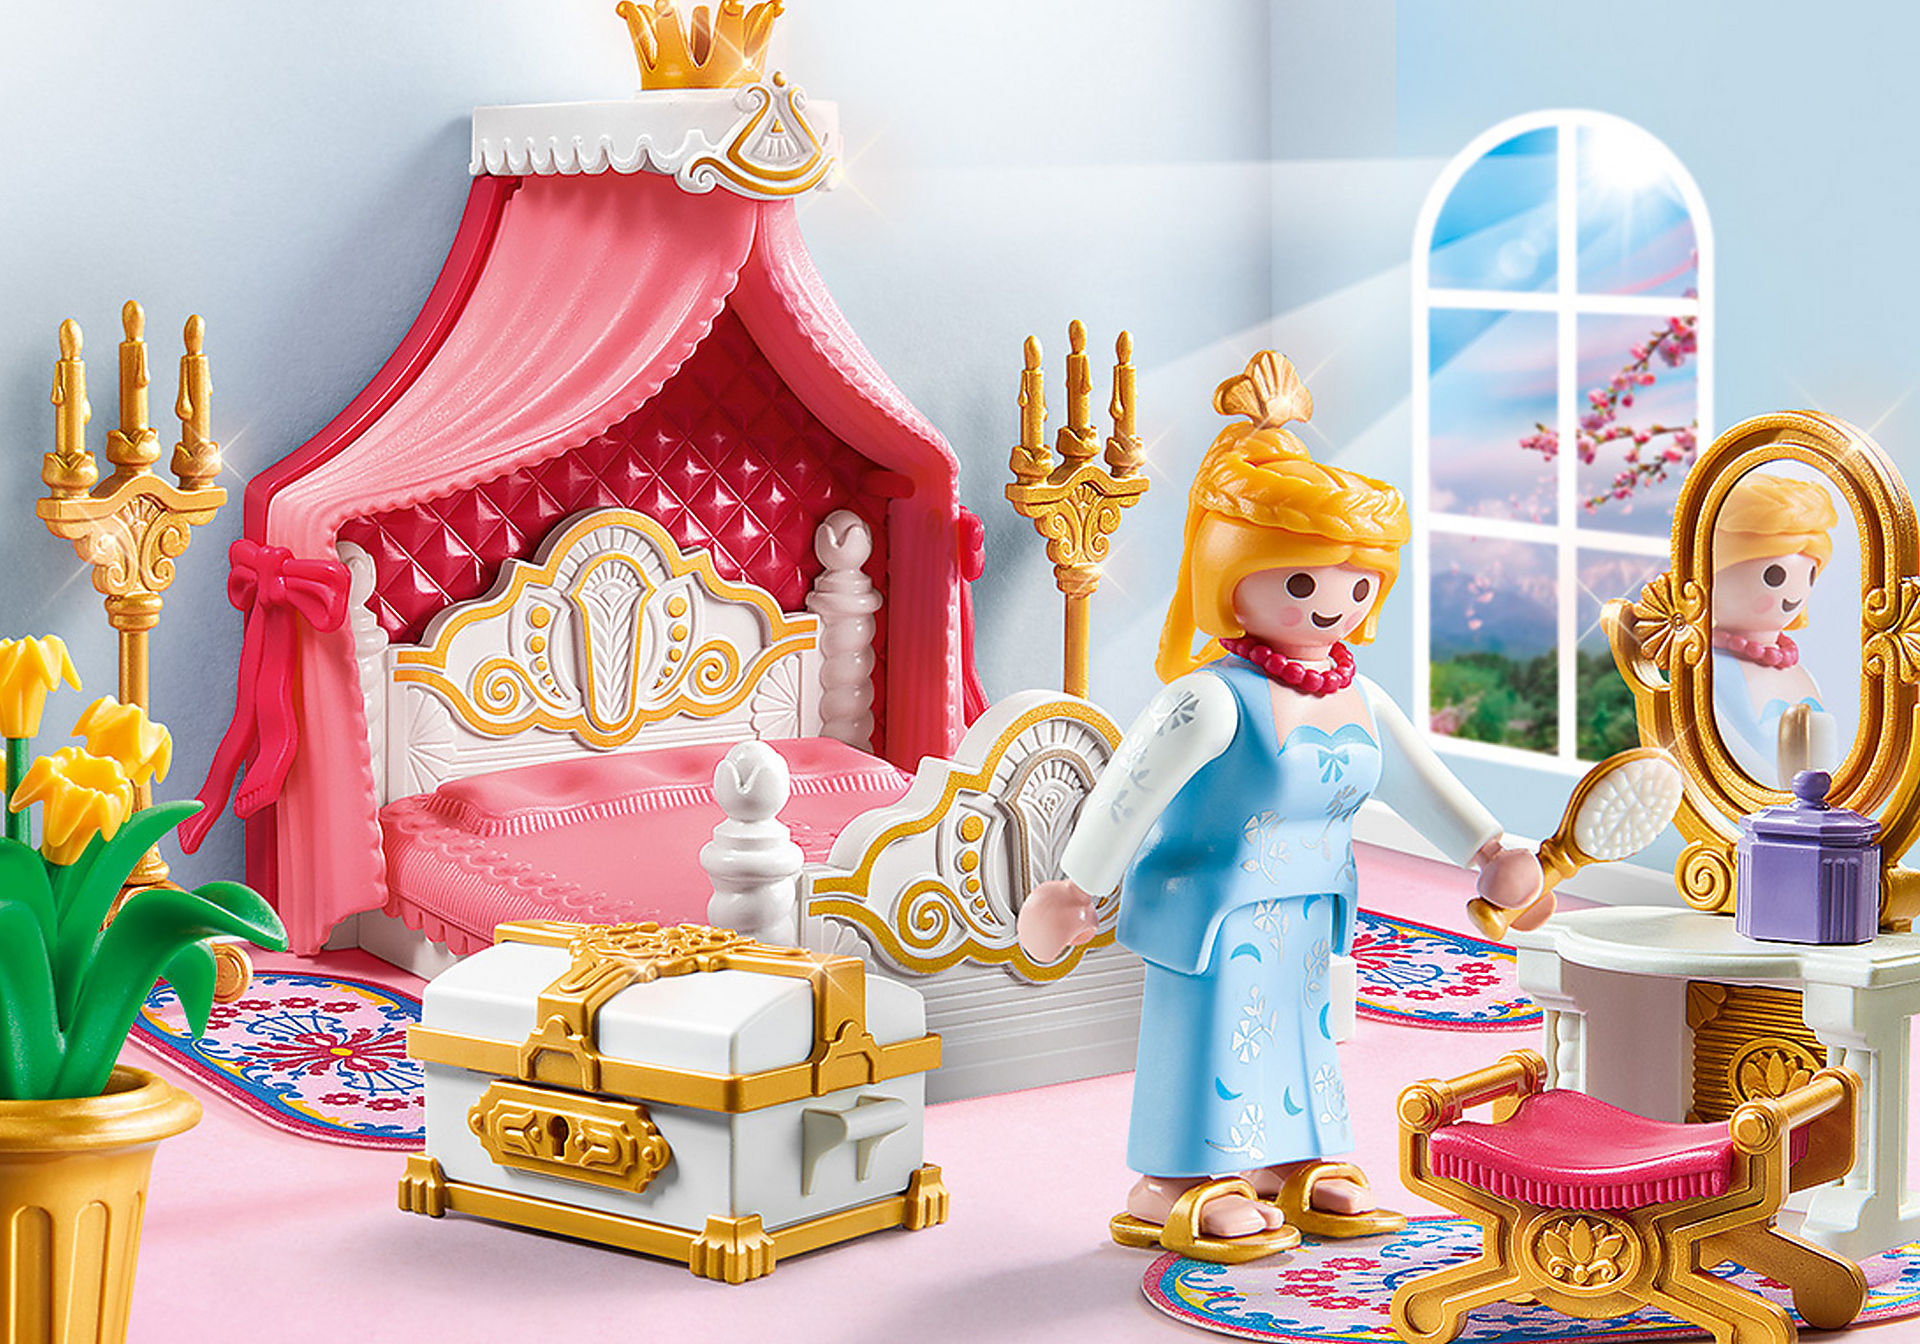 9889 Royal Bed Chamber zoom image1